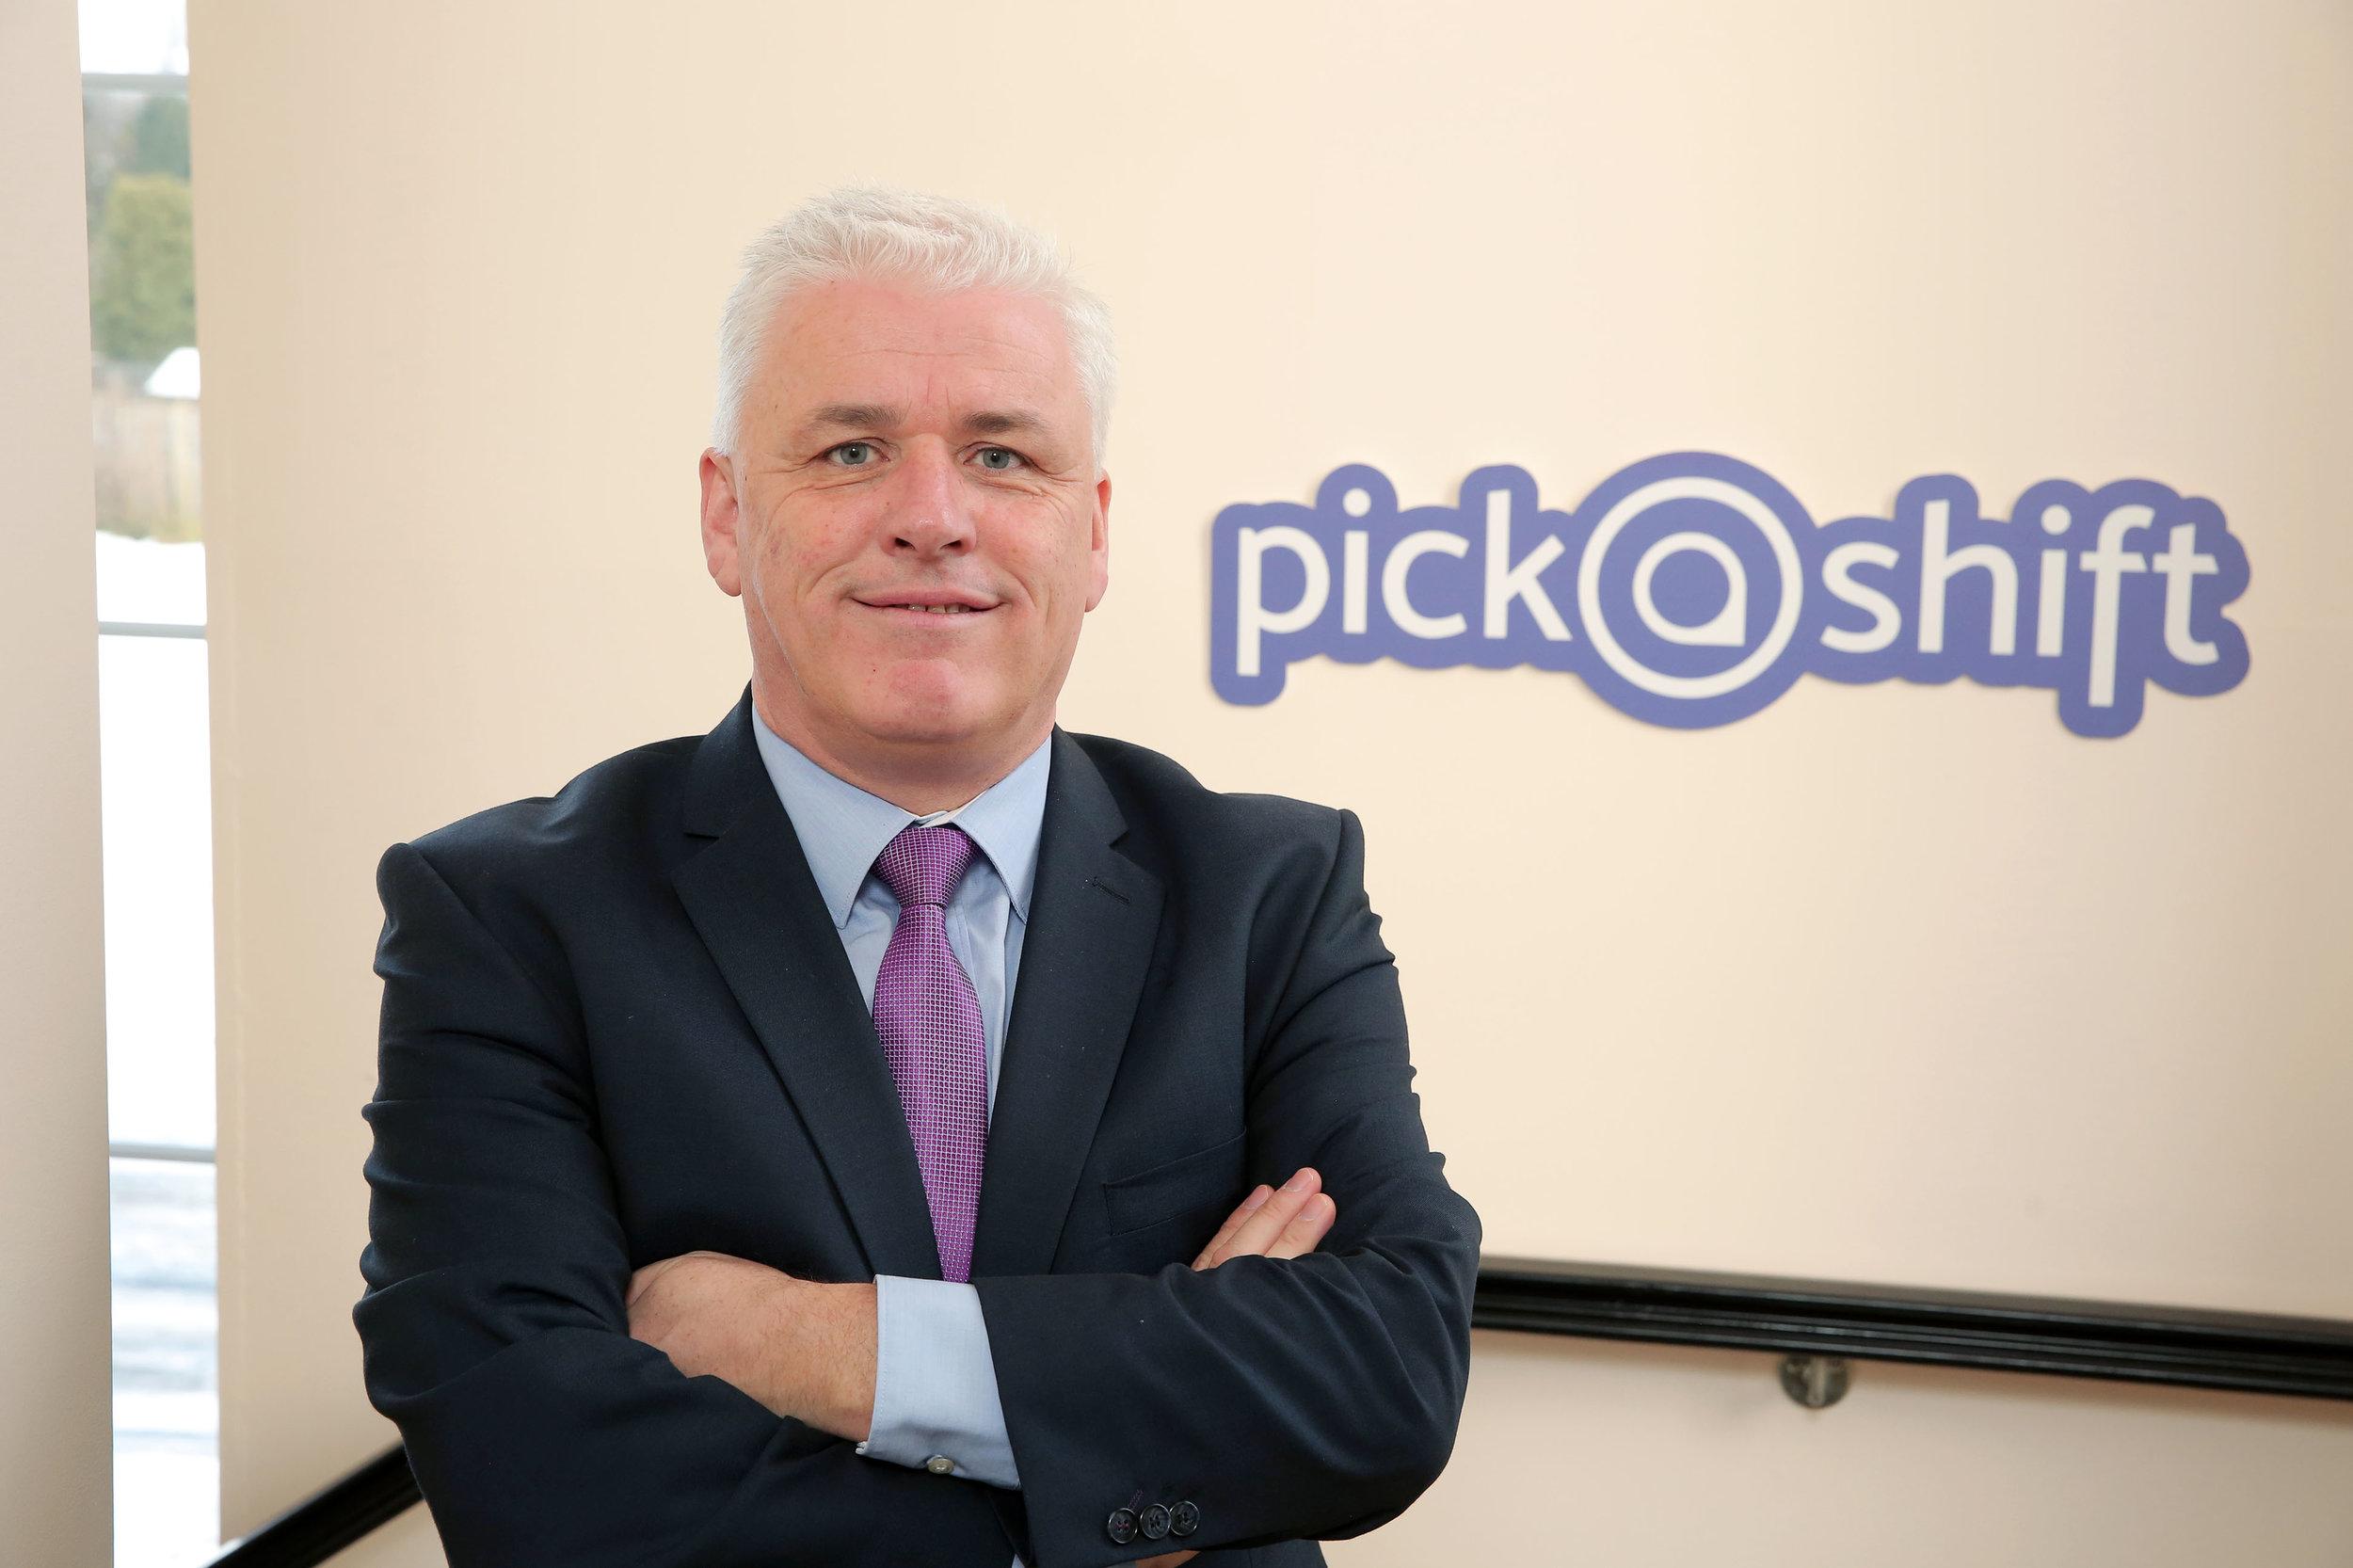 PickaShift Photo 6.JPG